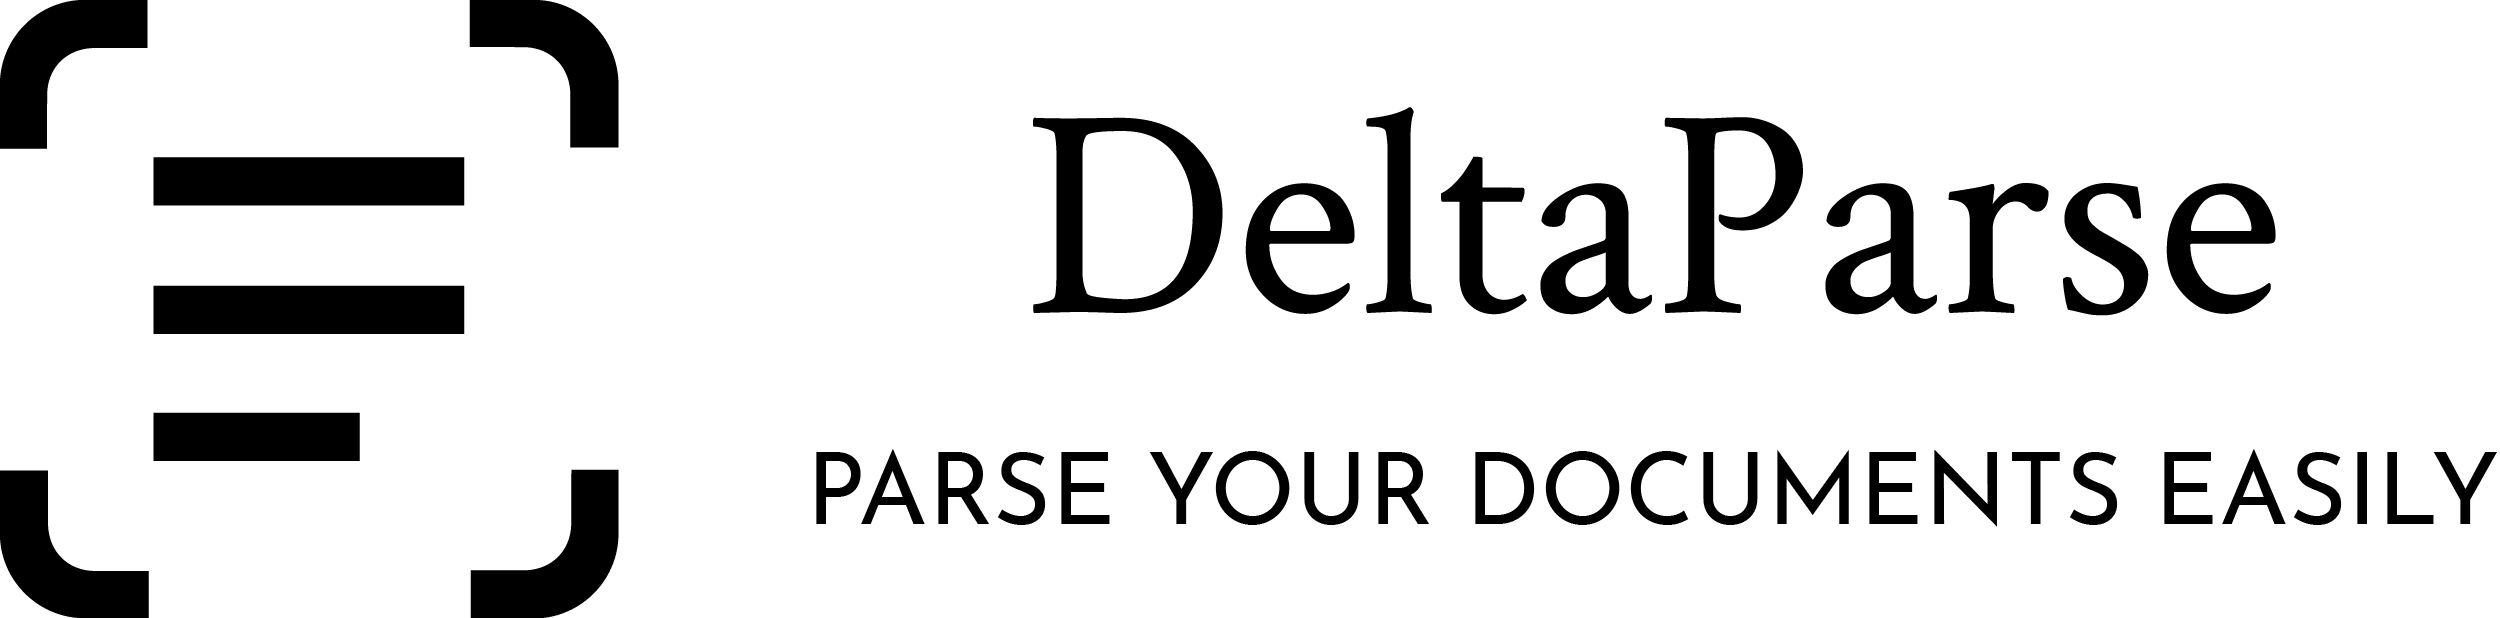 DeltaParse Brand logo